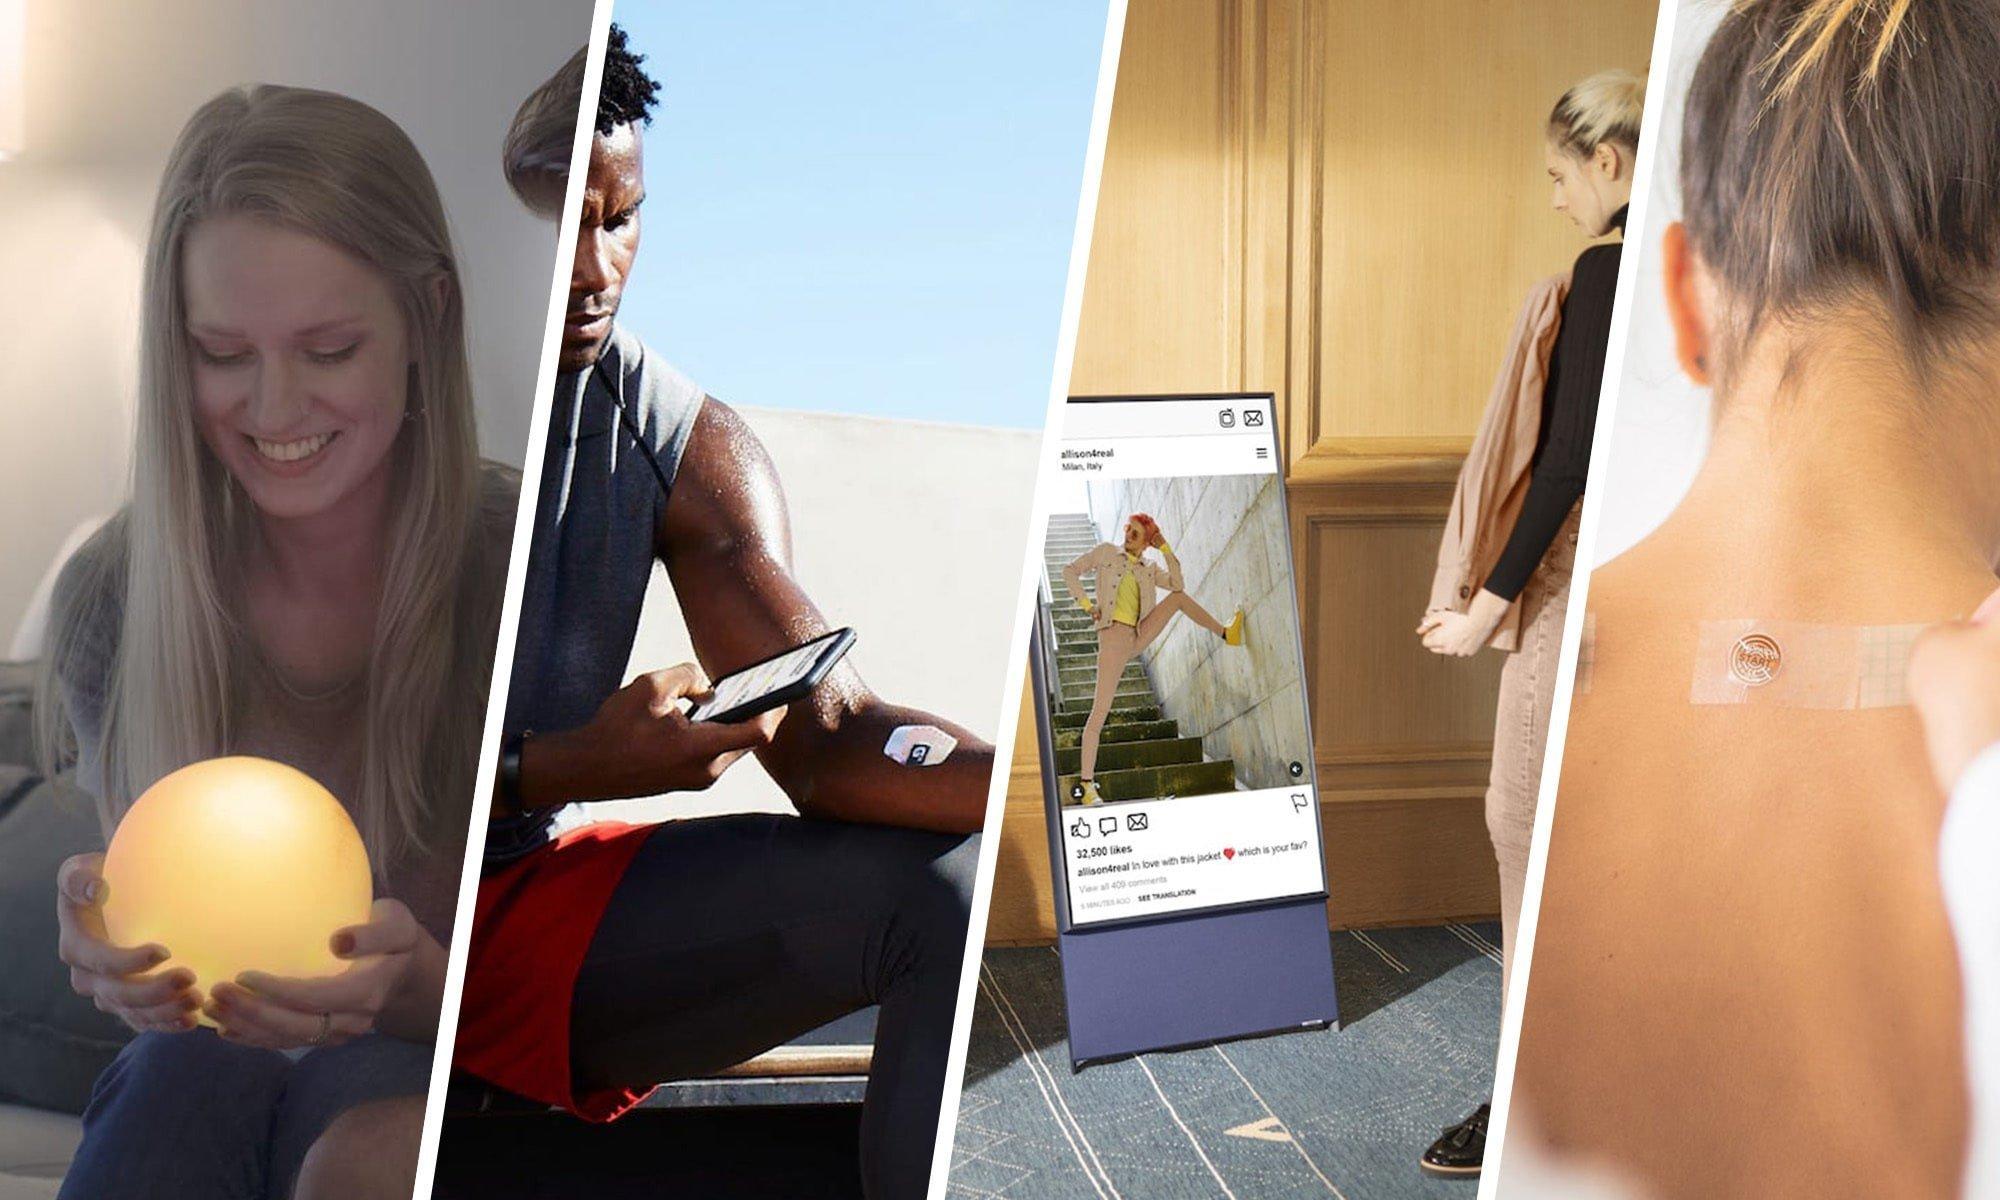 10 Smart tech gadgets that we guarantee you've never seen before